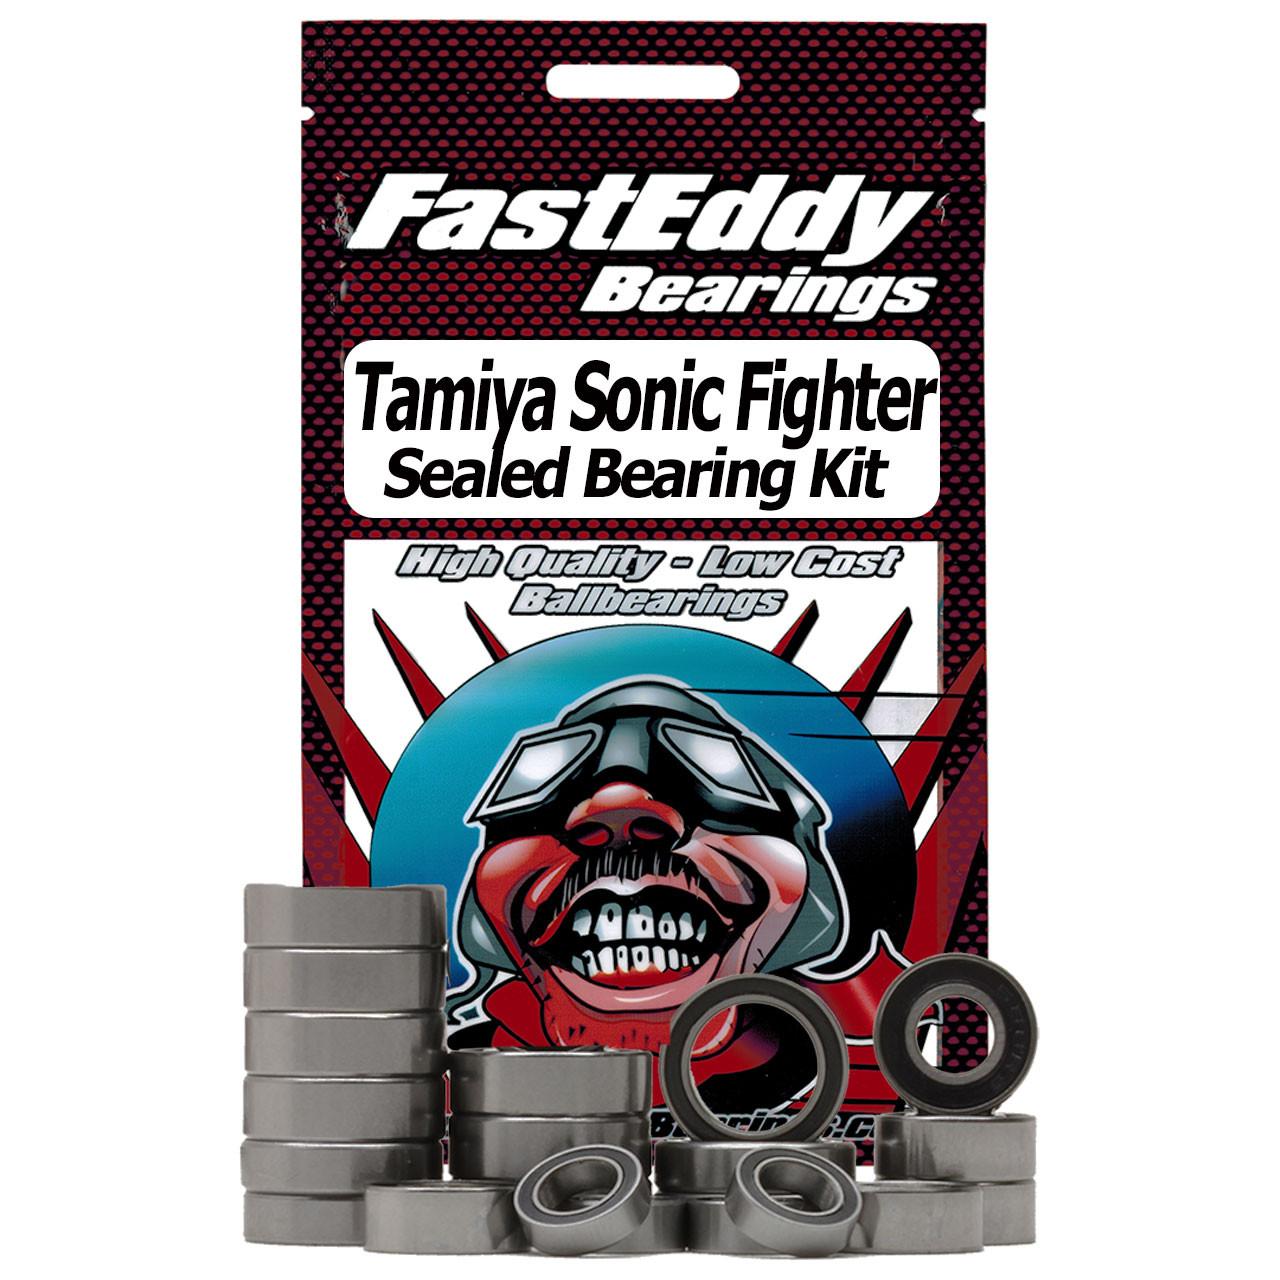 Tamiya Sonic Fighter Bearing set Quality RC Ball Bearings